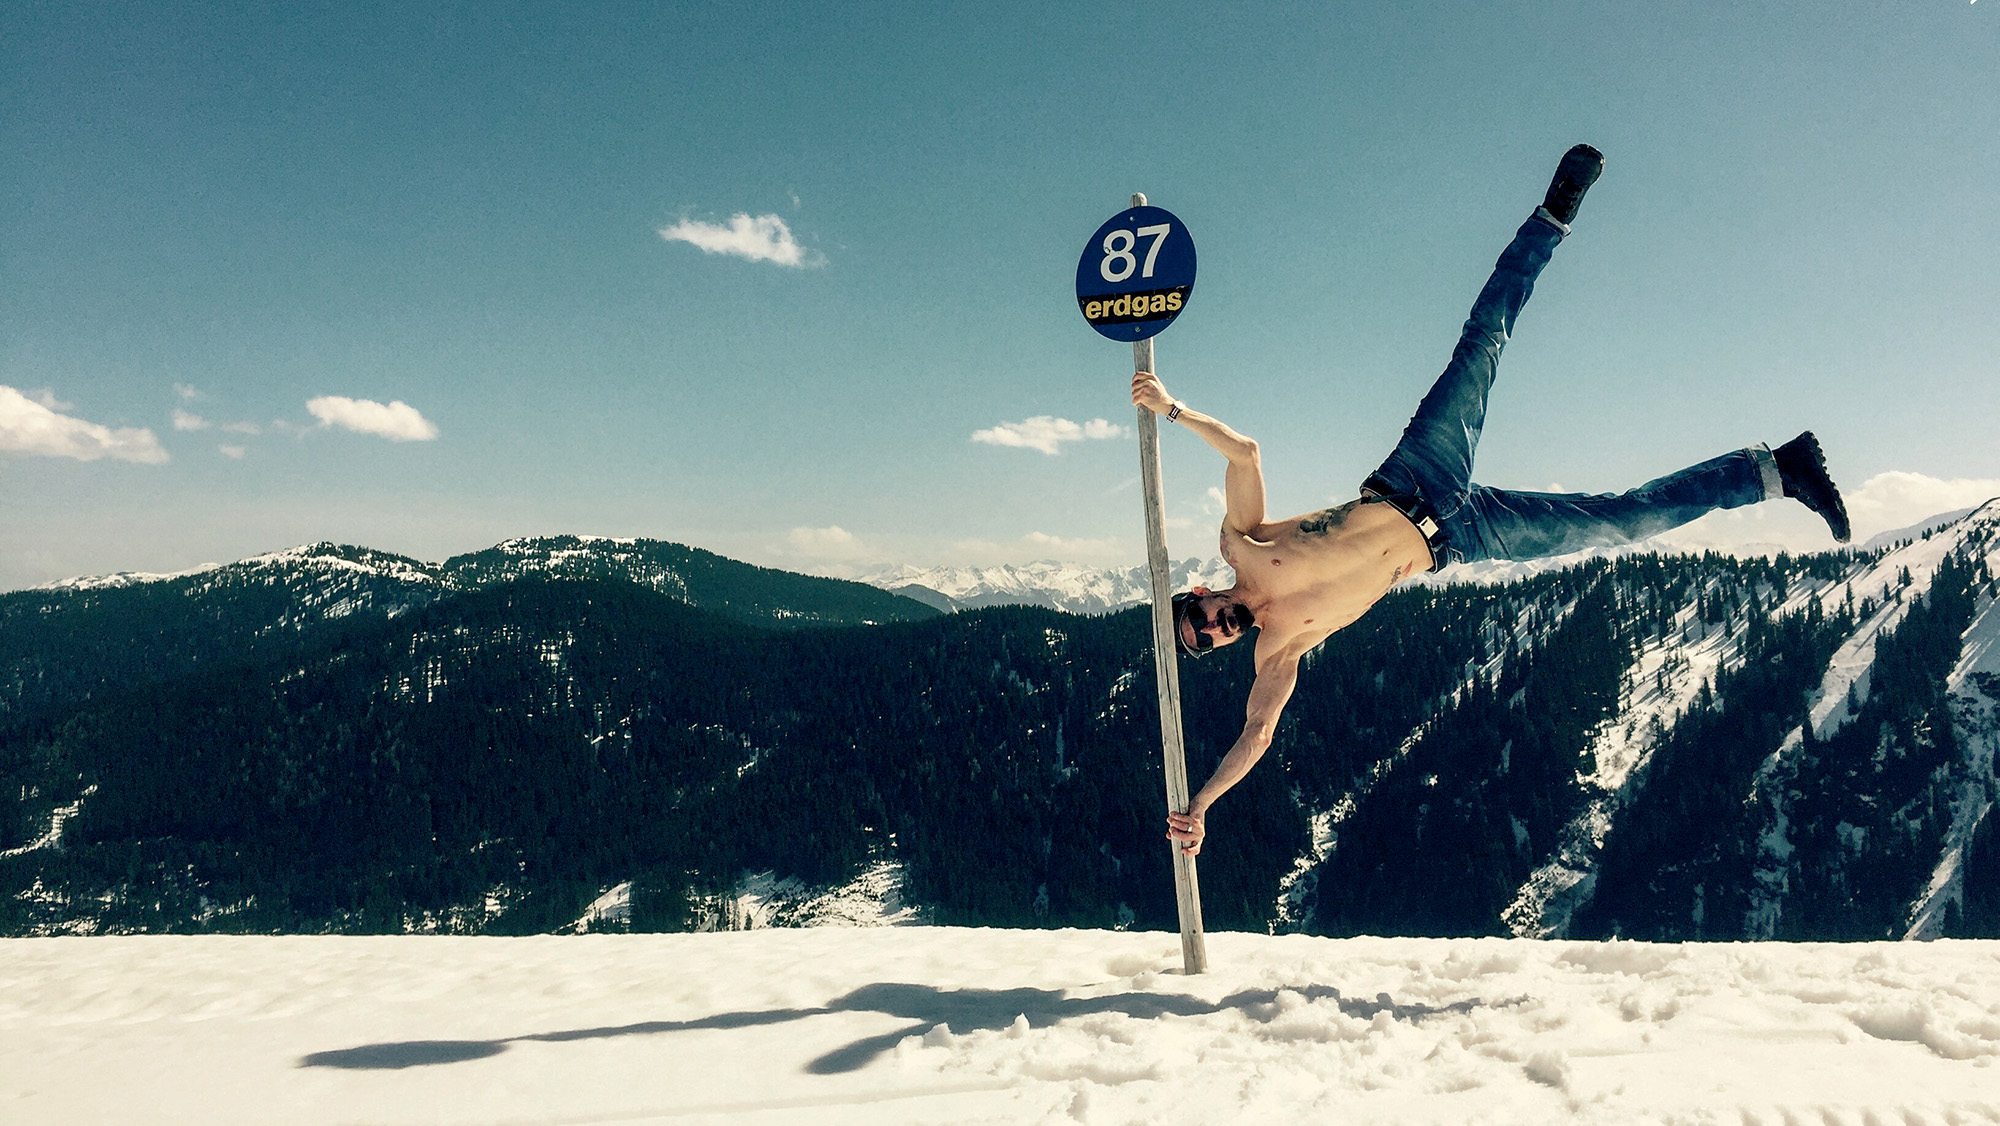 Photo: Crossfit.com